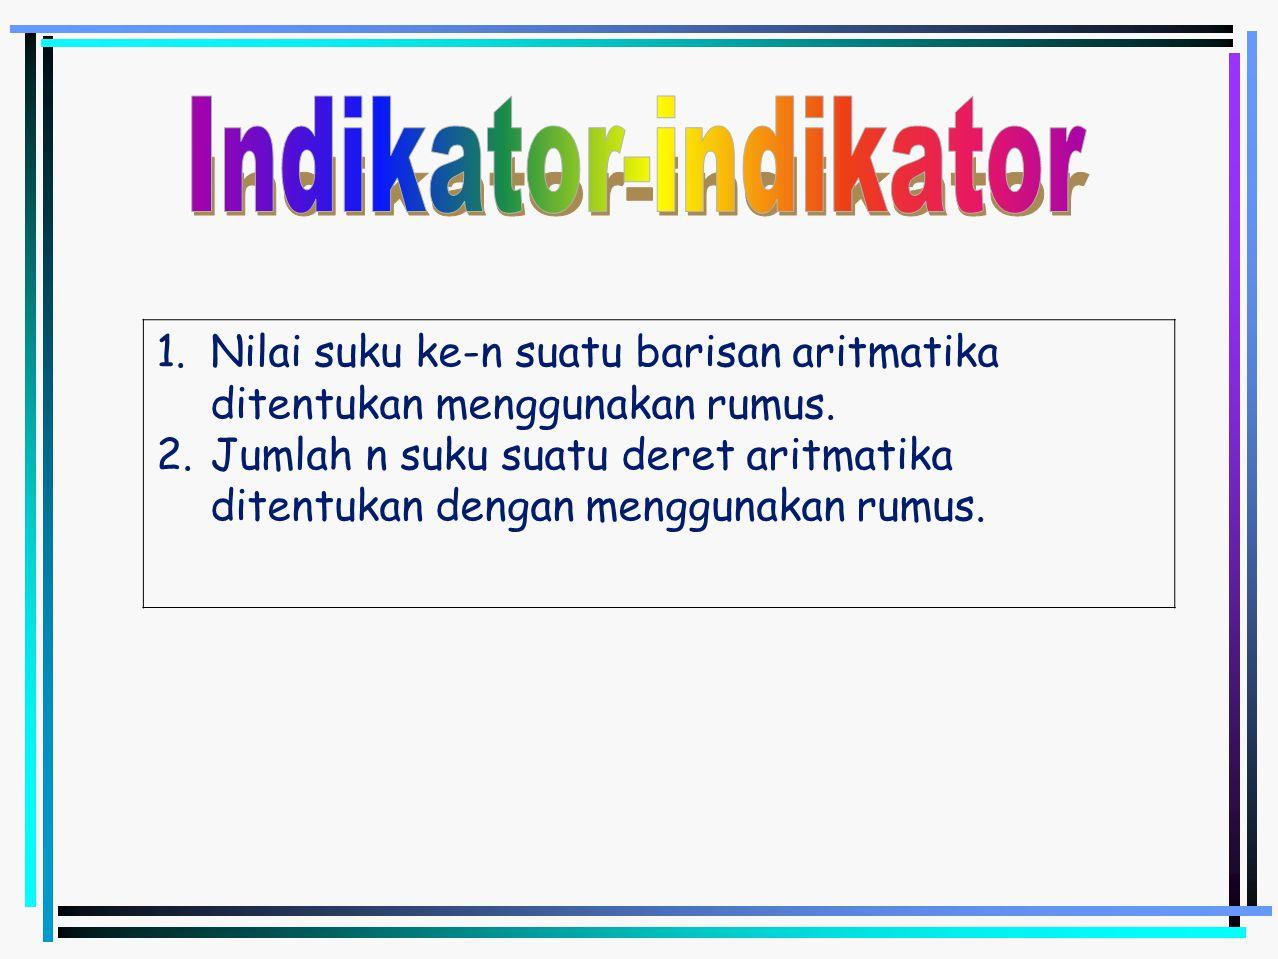 Indikator-indikator Nilai suku ke-n suatu barisan aritmatika ditentukan menggunakan rumus.